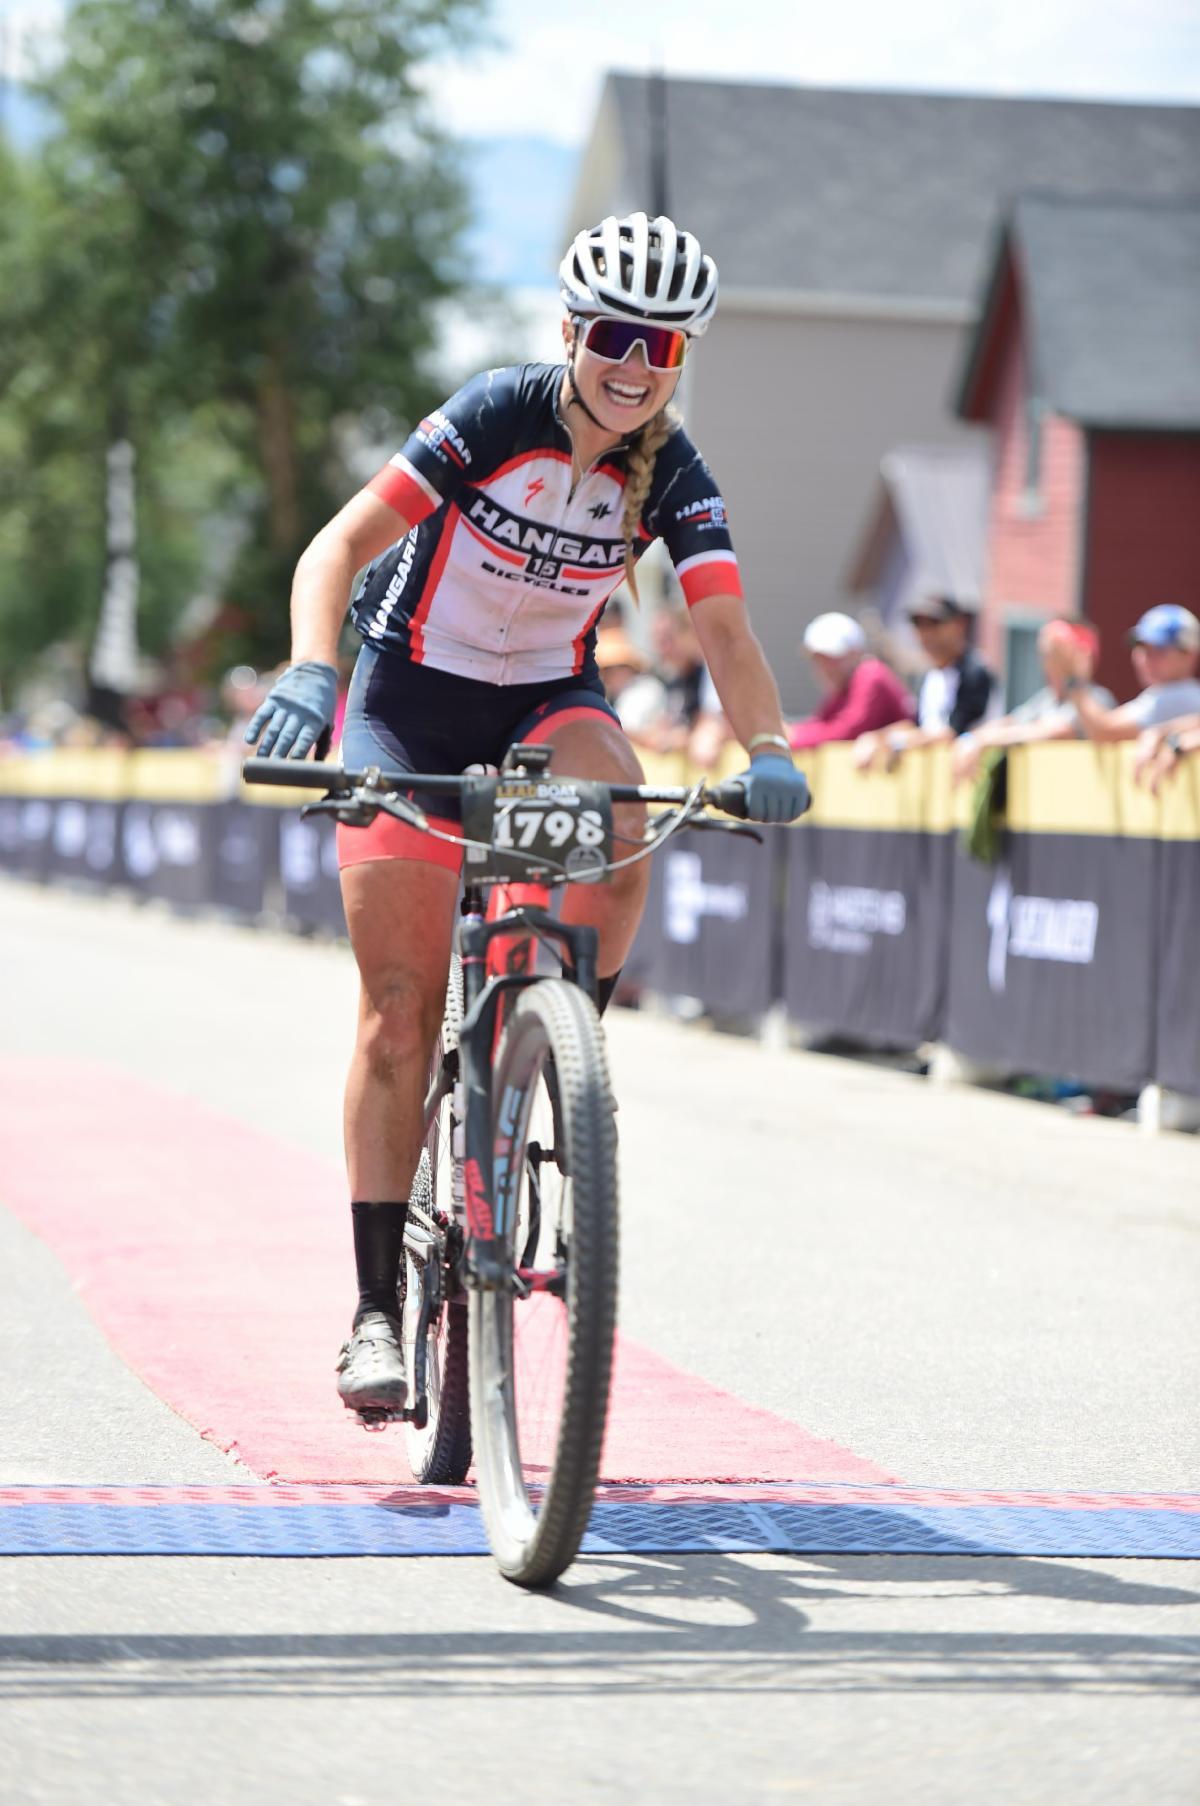 Melisa Rollins finishing 6th at the Leadville 100. Photo courtesy TWENTY24 Pro Cycling